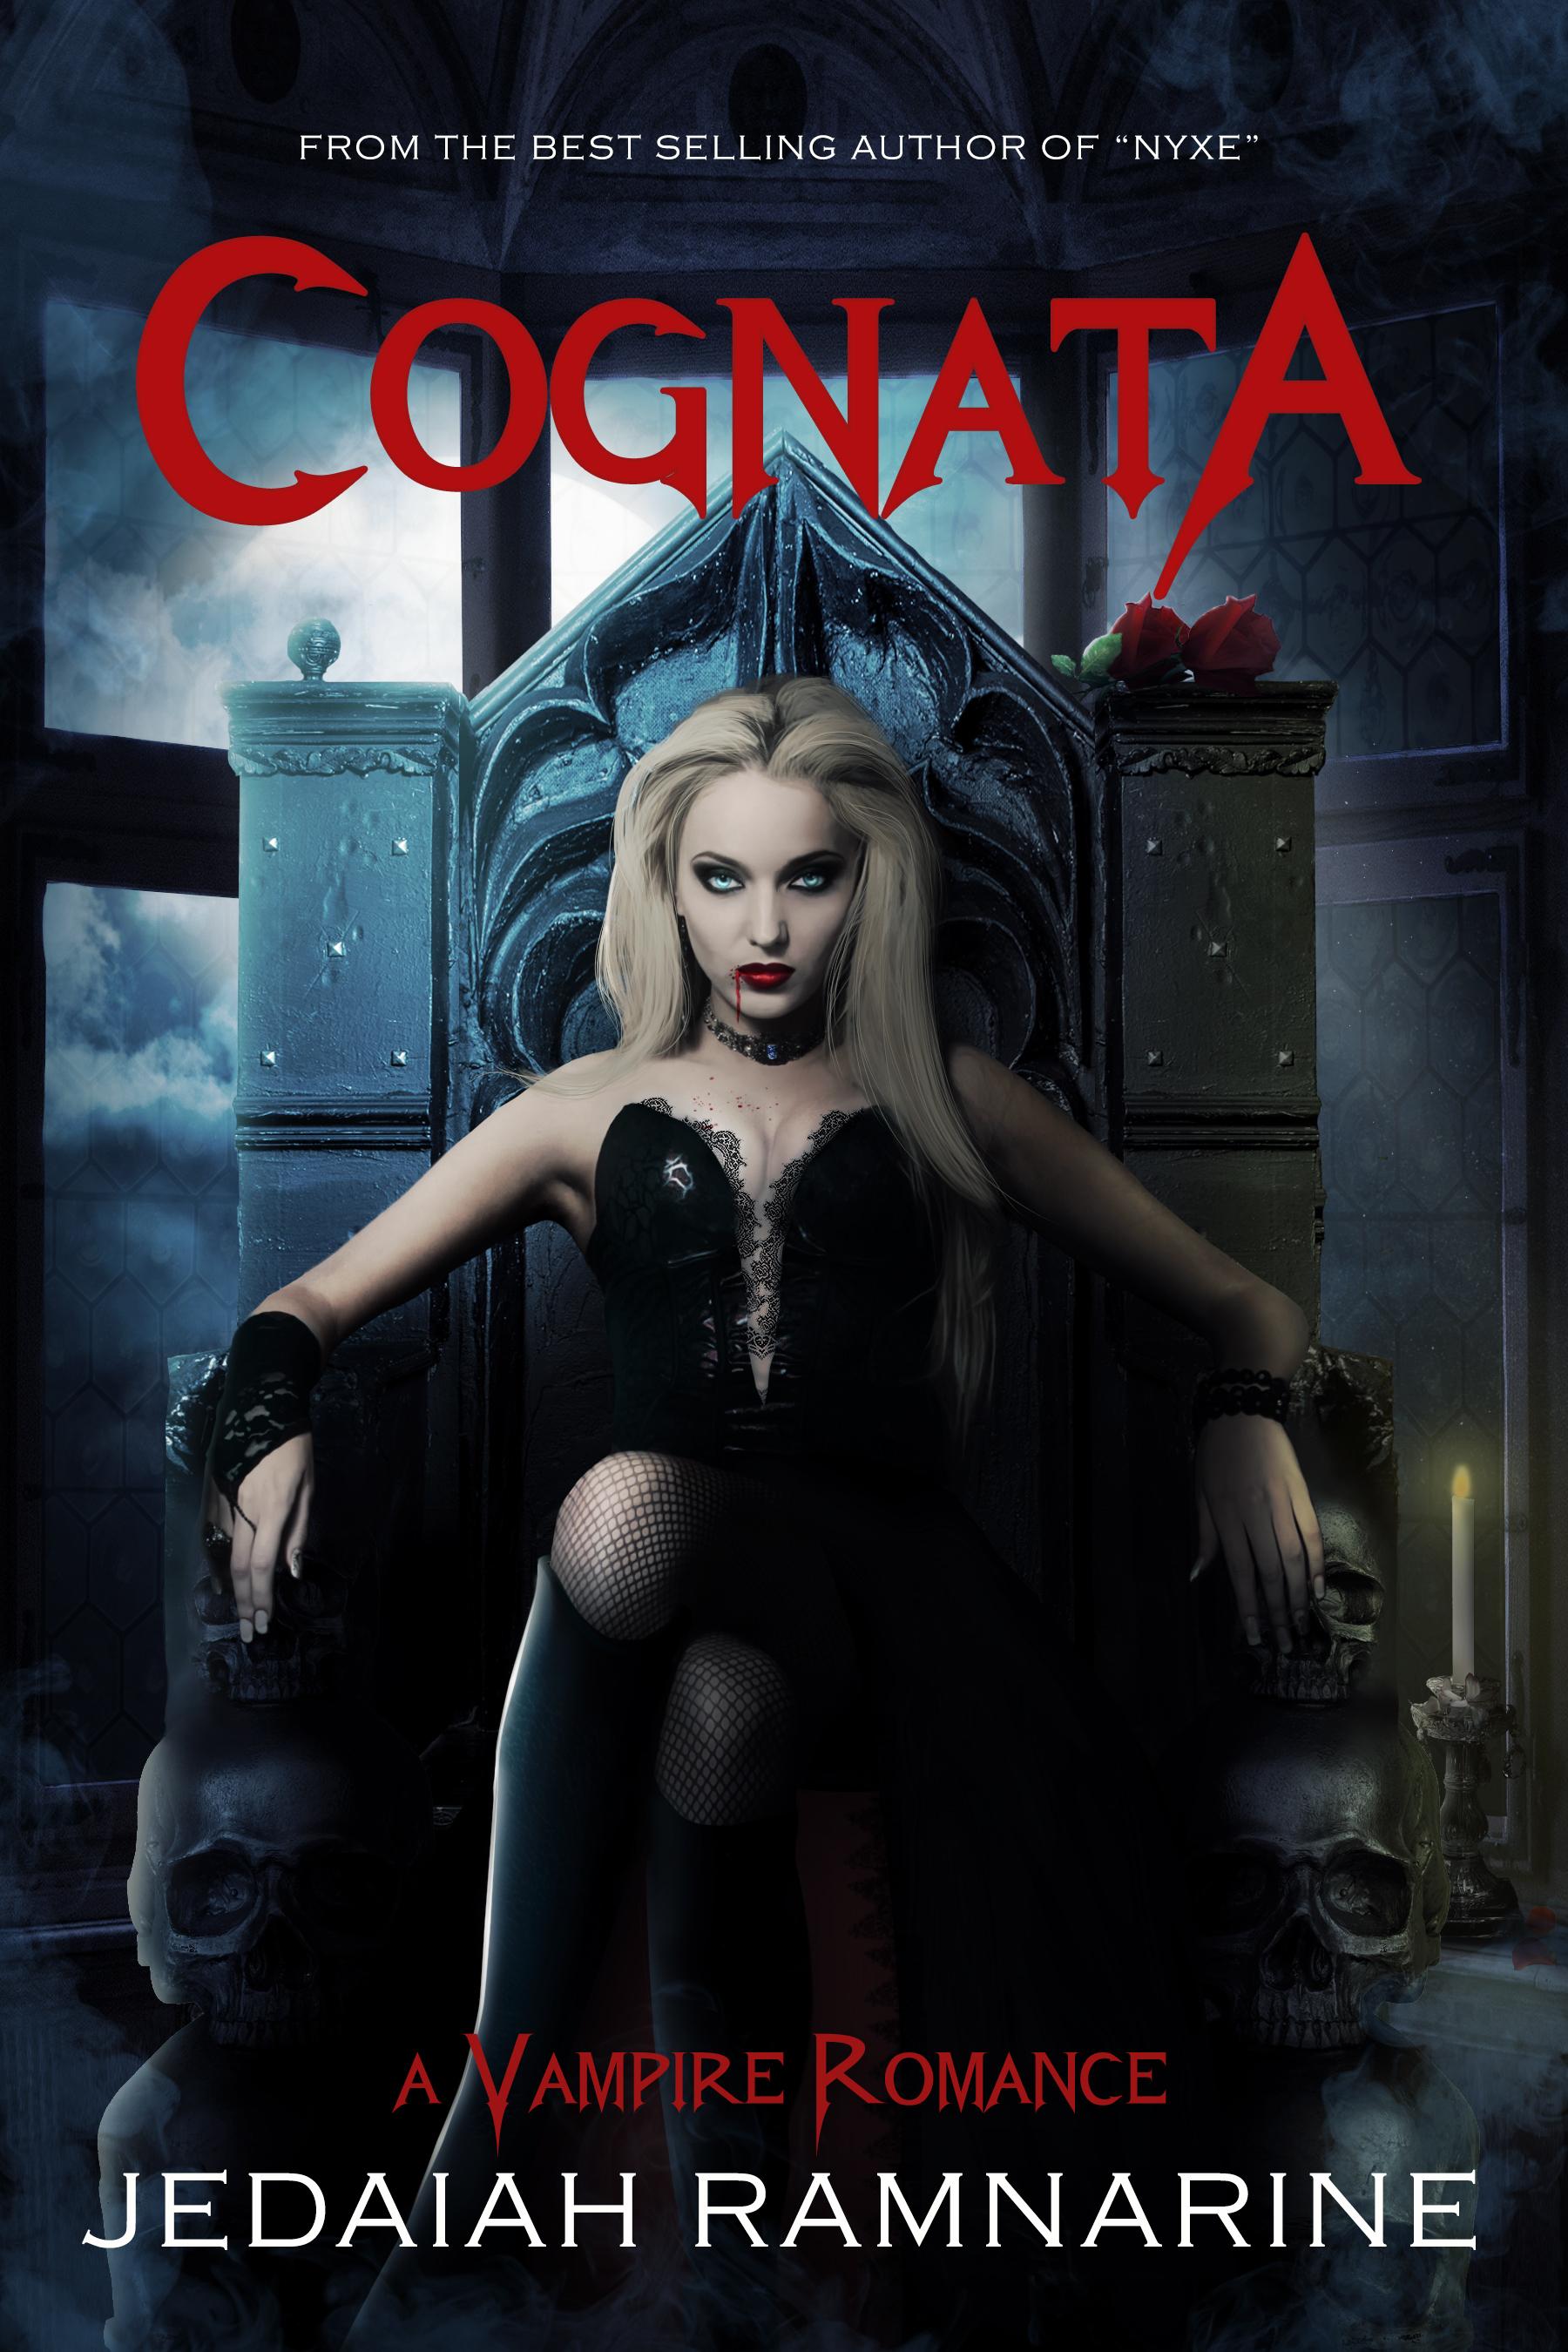 Cognata: A Vampire Romance Jedaiah Ramnarine